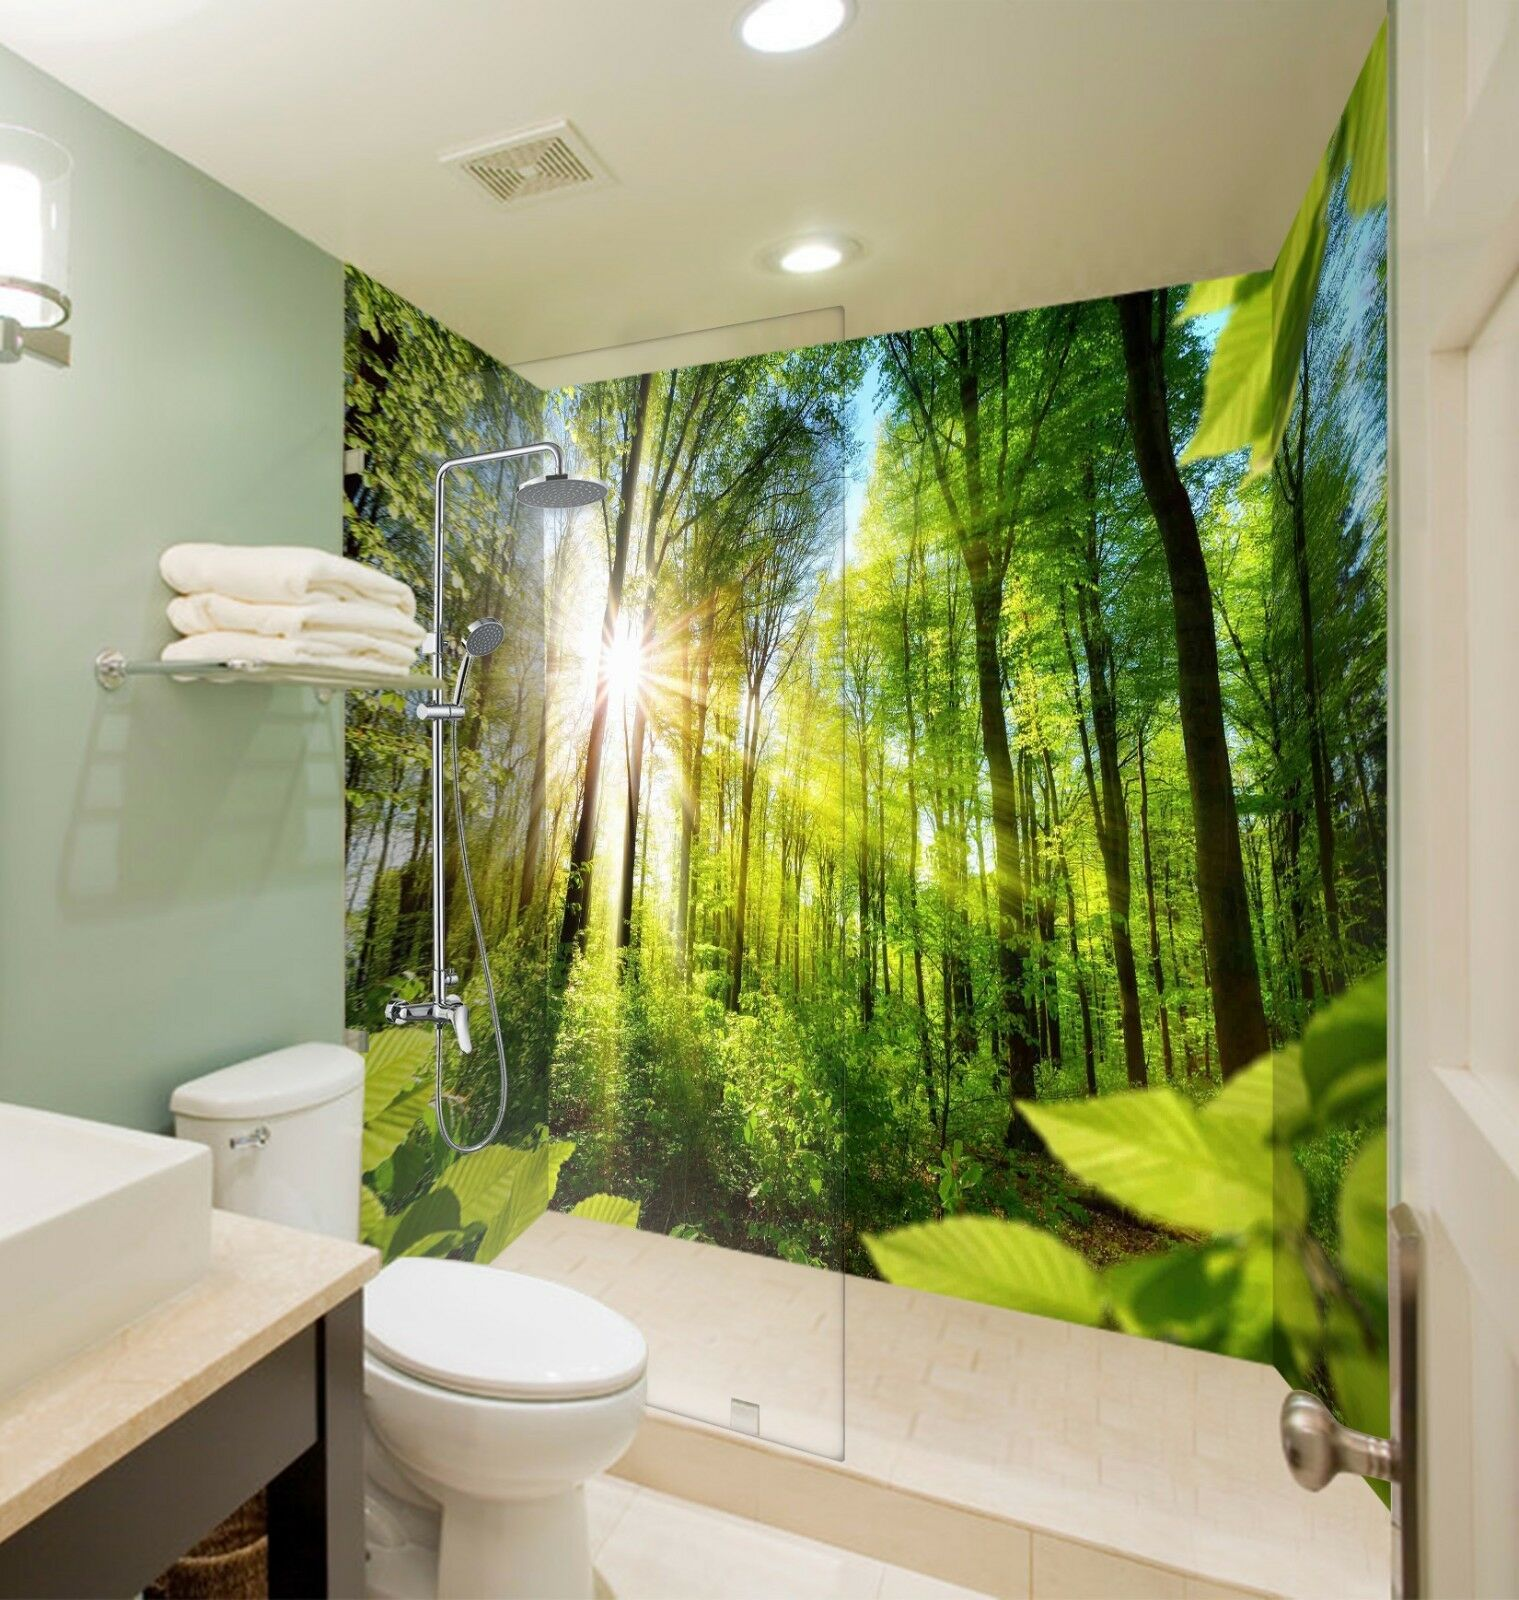 3D Sunshine forest 637 WallPaper Bathroom Print Decal Wall Deco AJ WALLPAPER UK